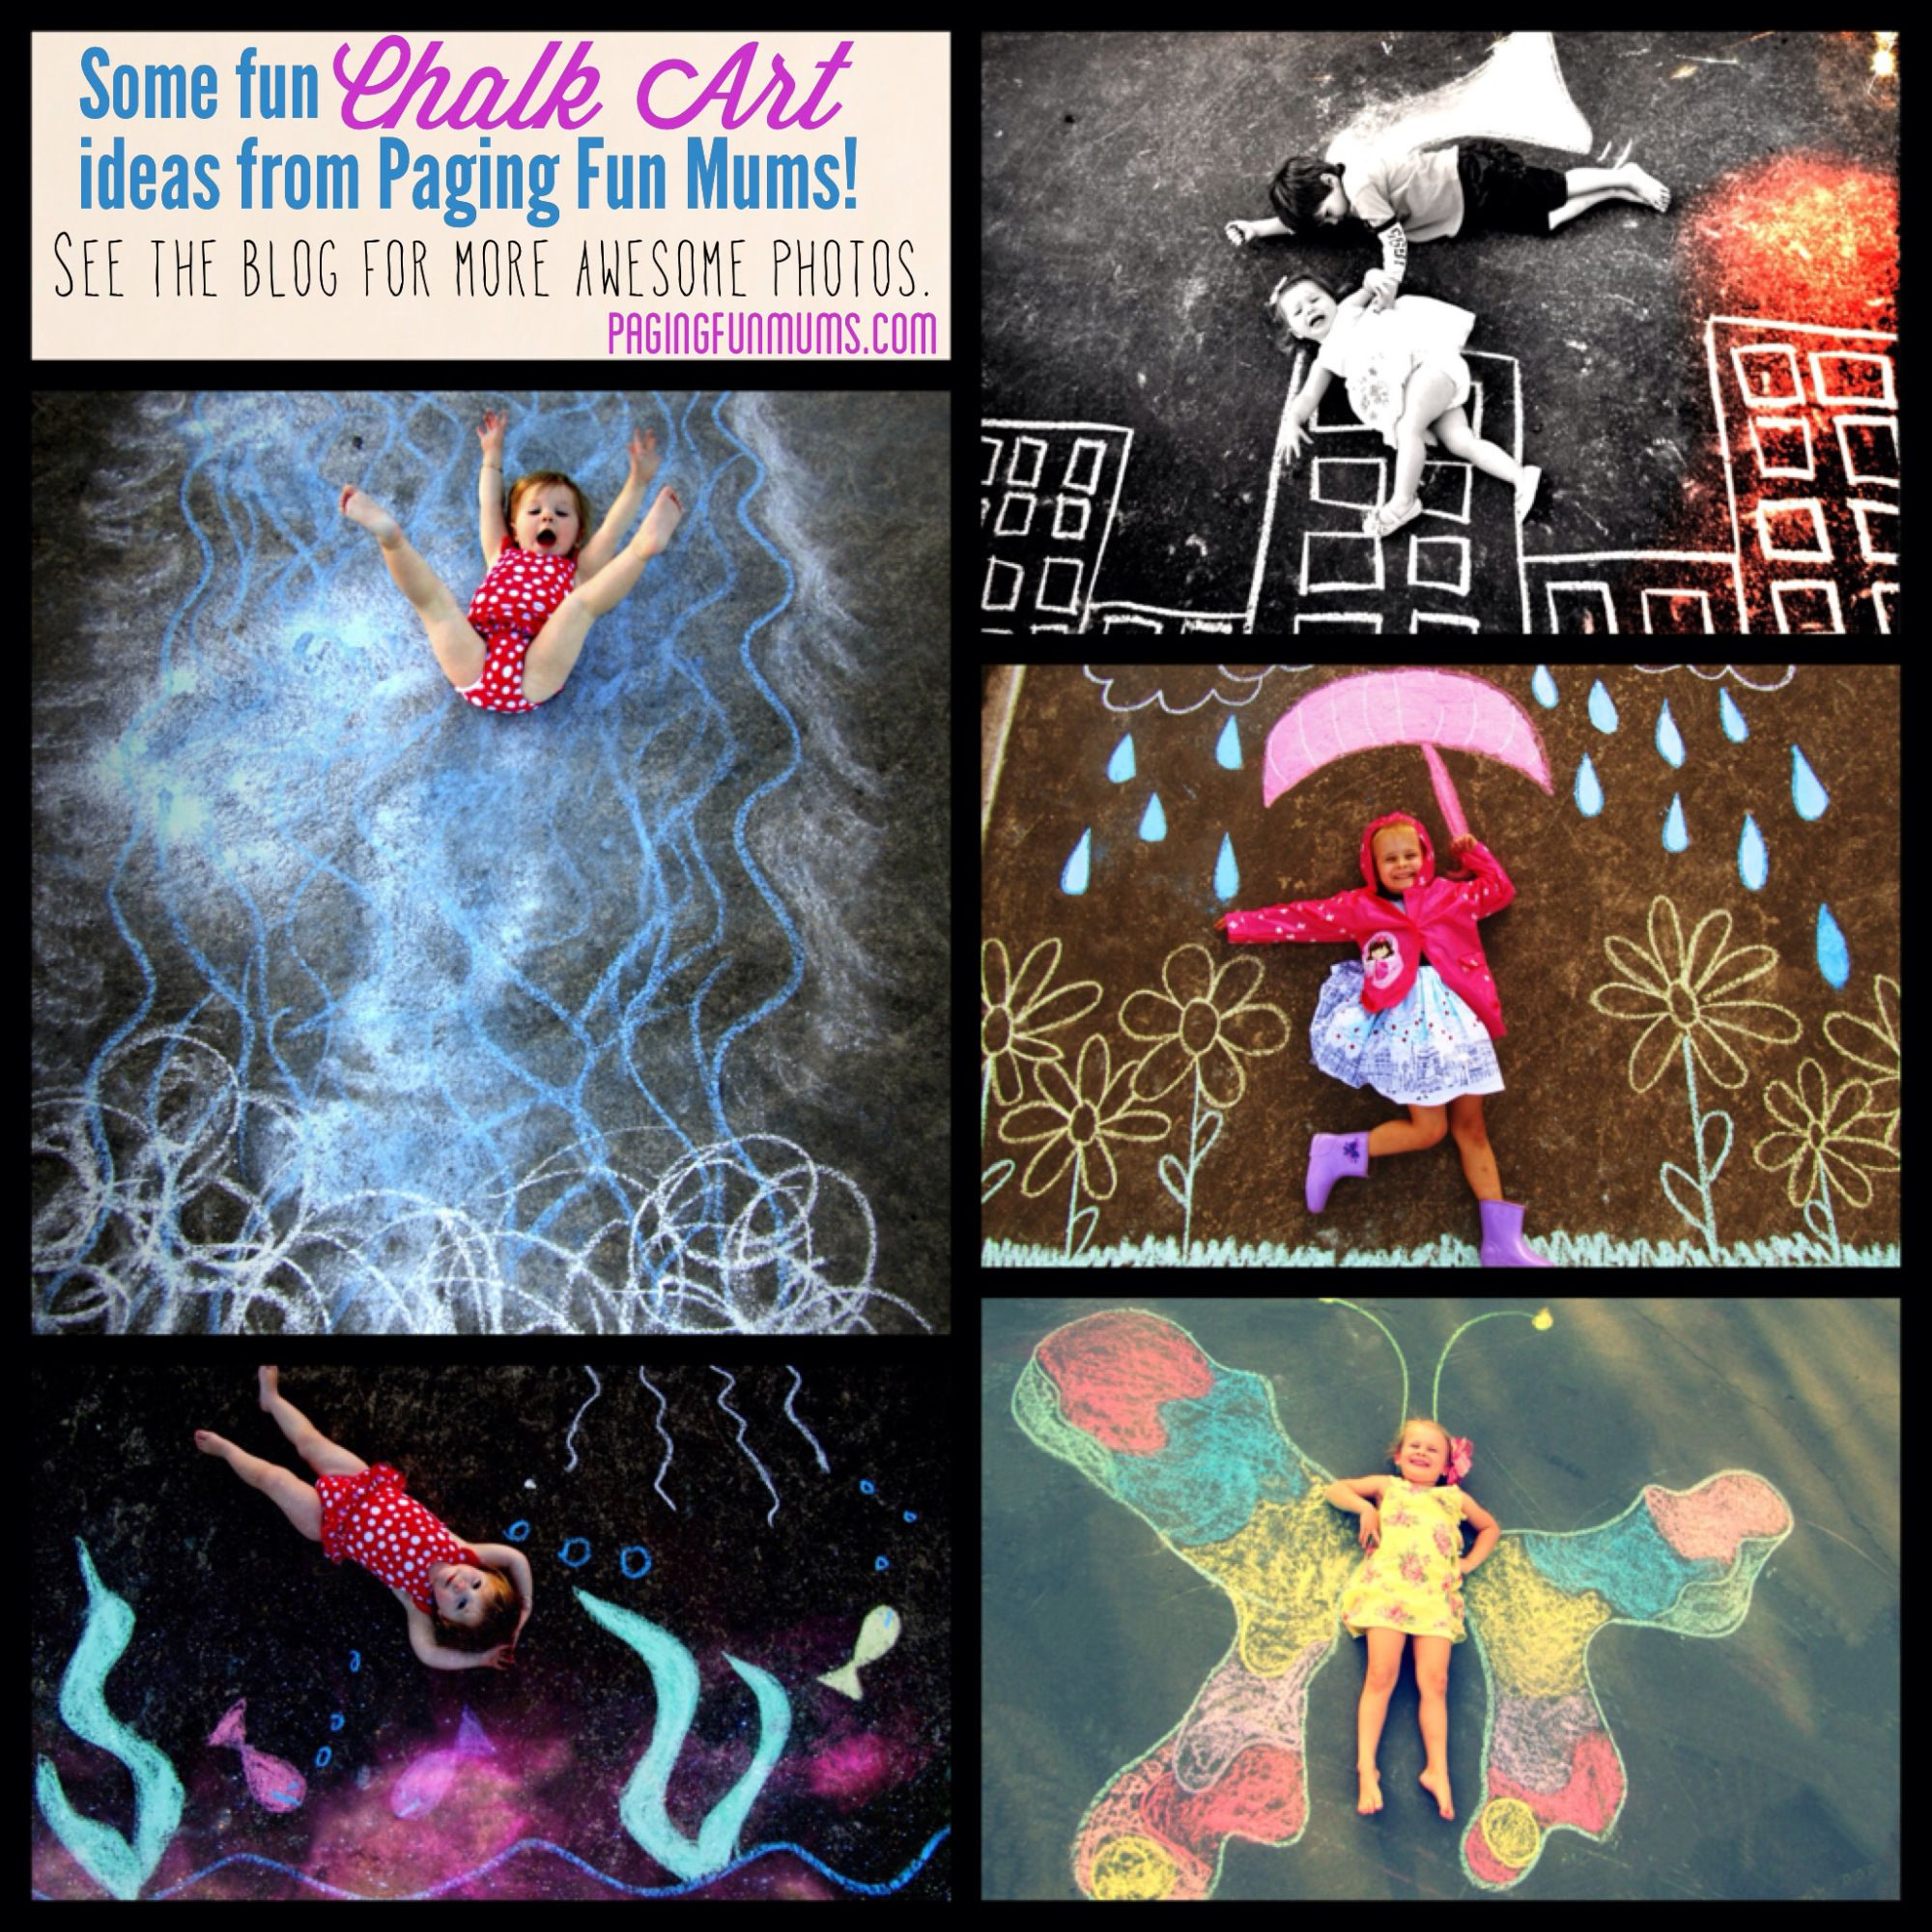 The Chalk Art Craze | Sidewalk chalk art, Sidewalk chalk and Sidewalk